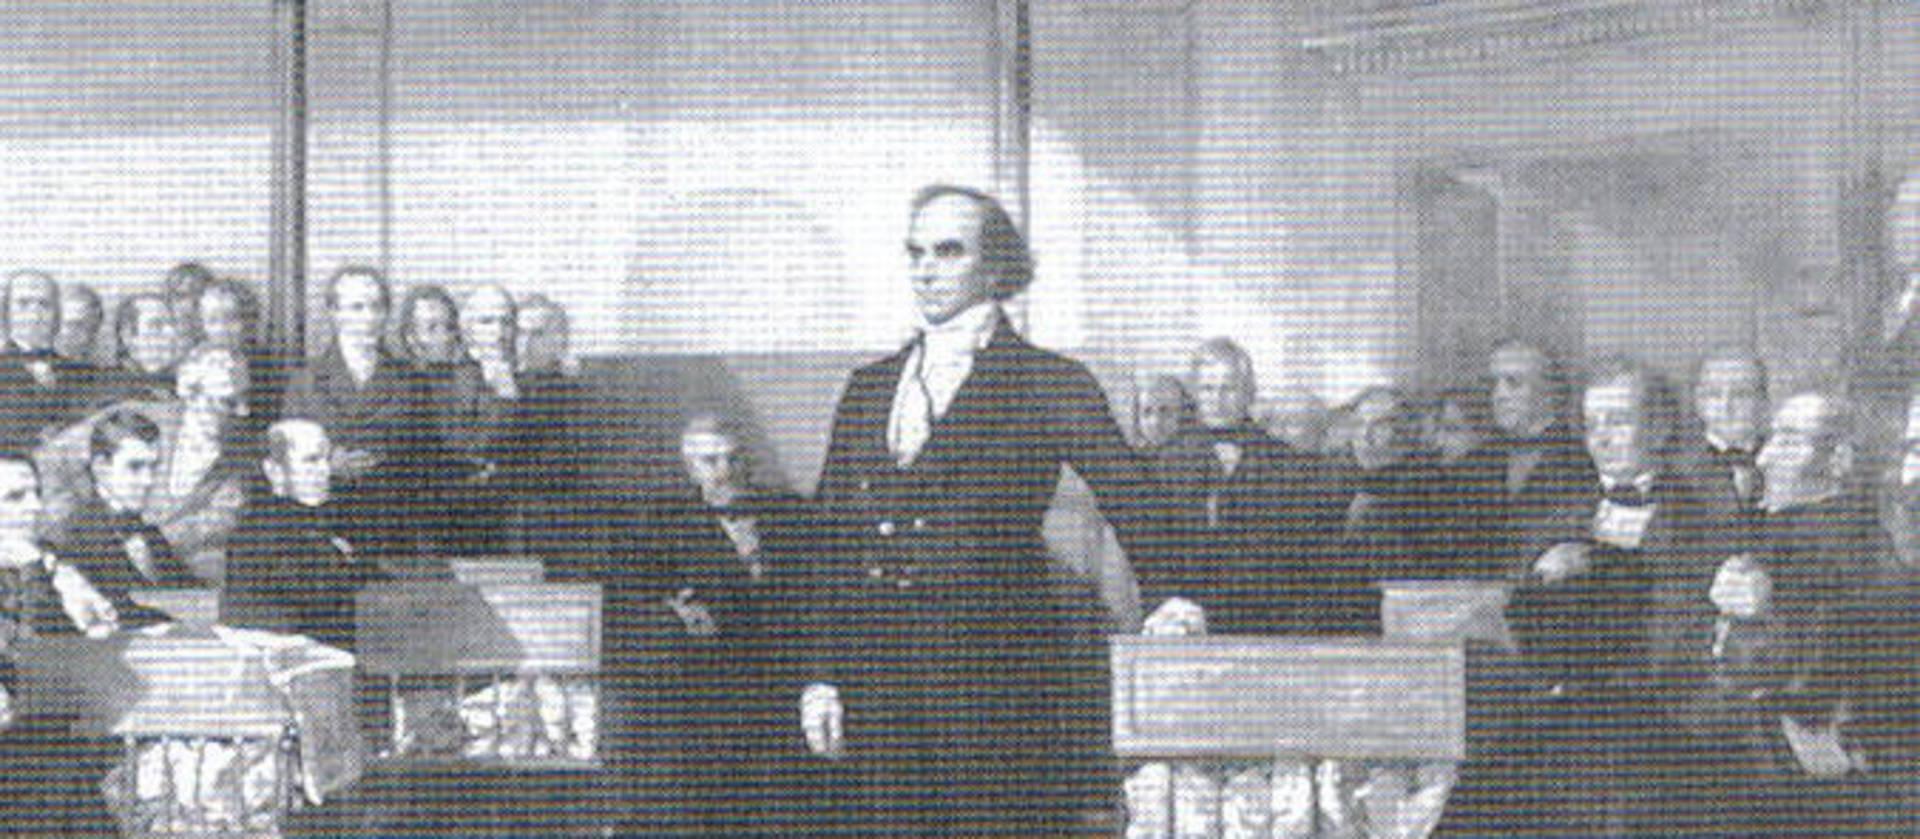 Van Buren contra el póker de candidatos del Partido Whig (1836)